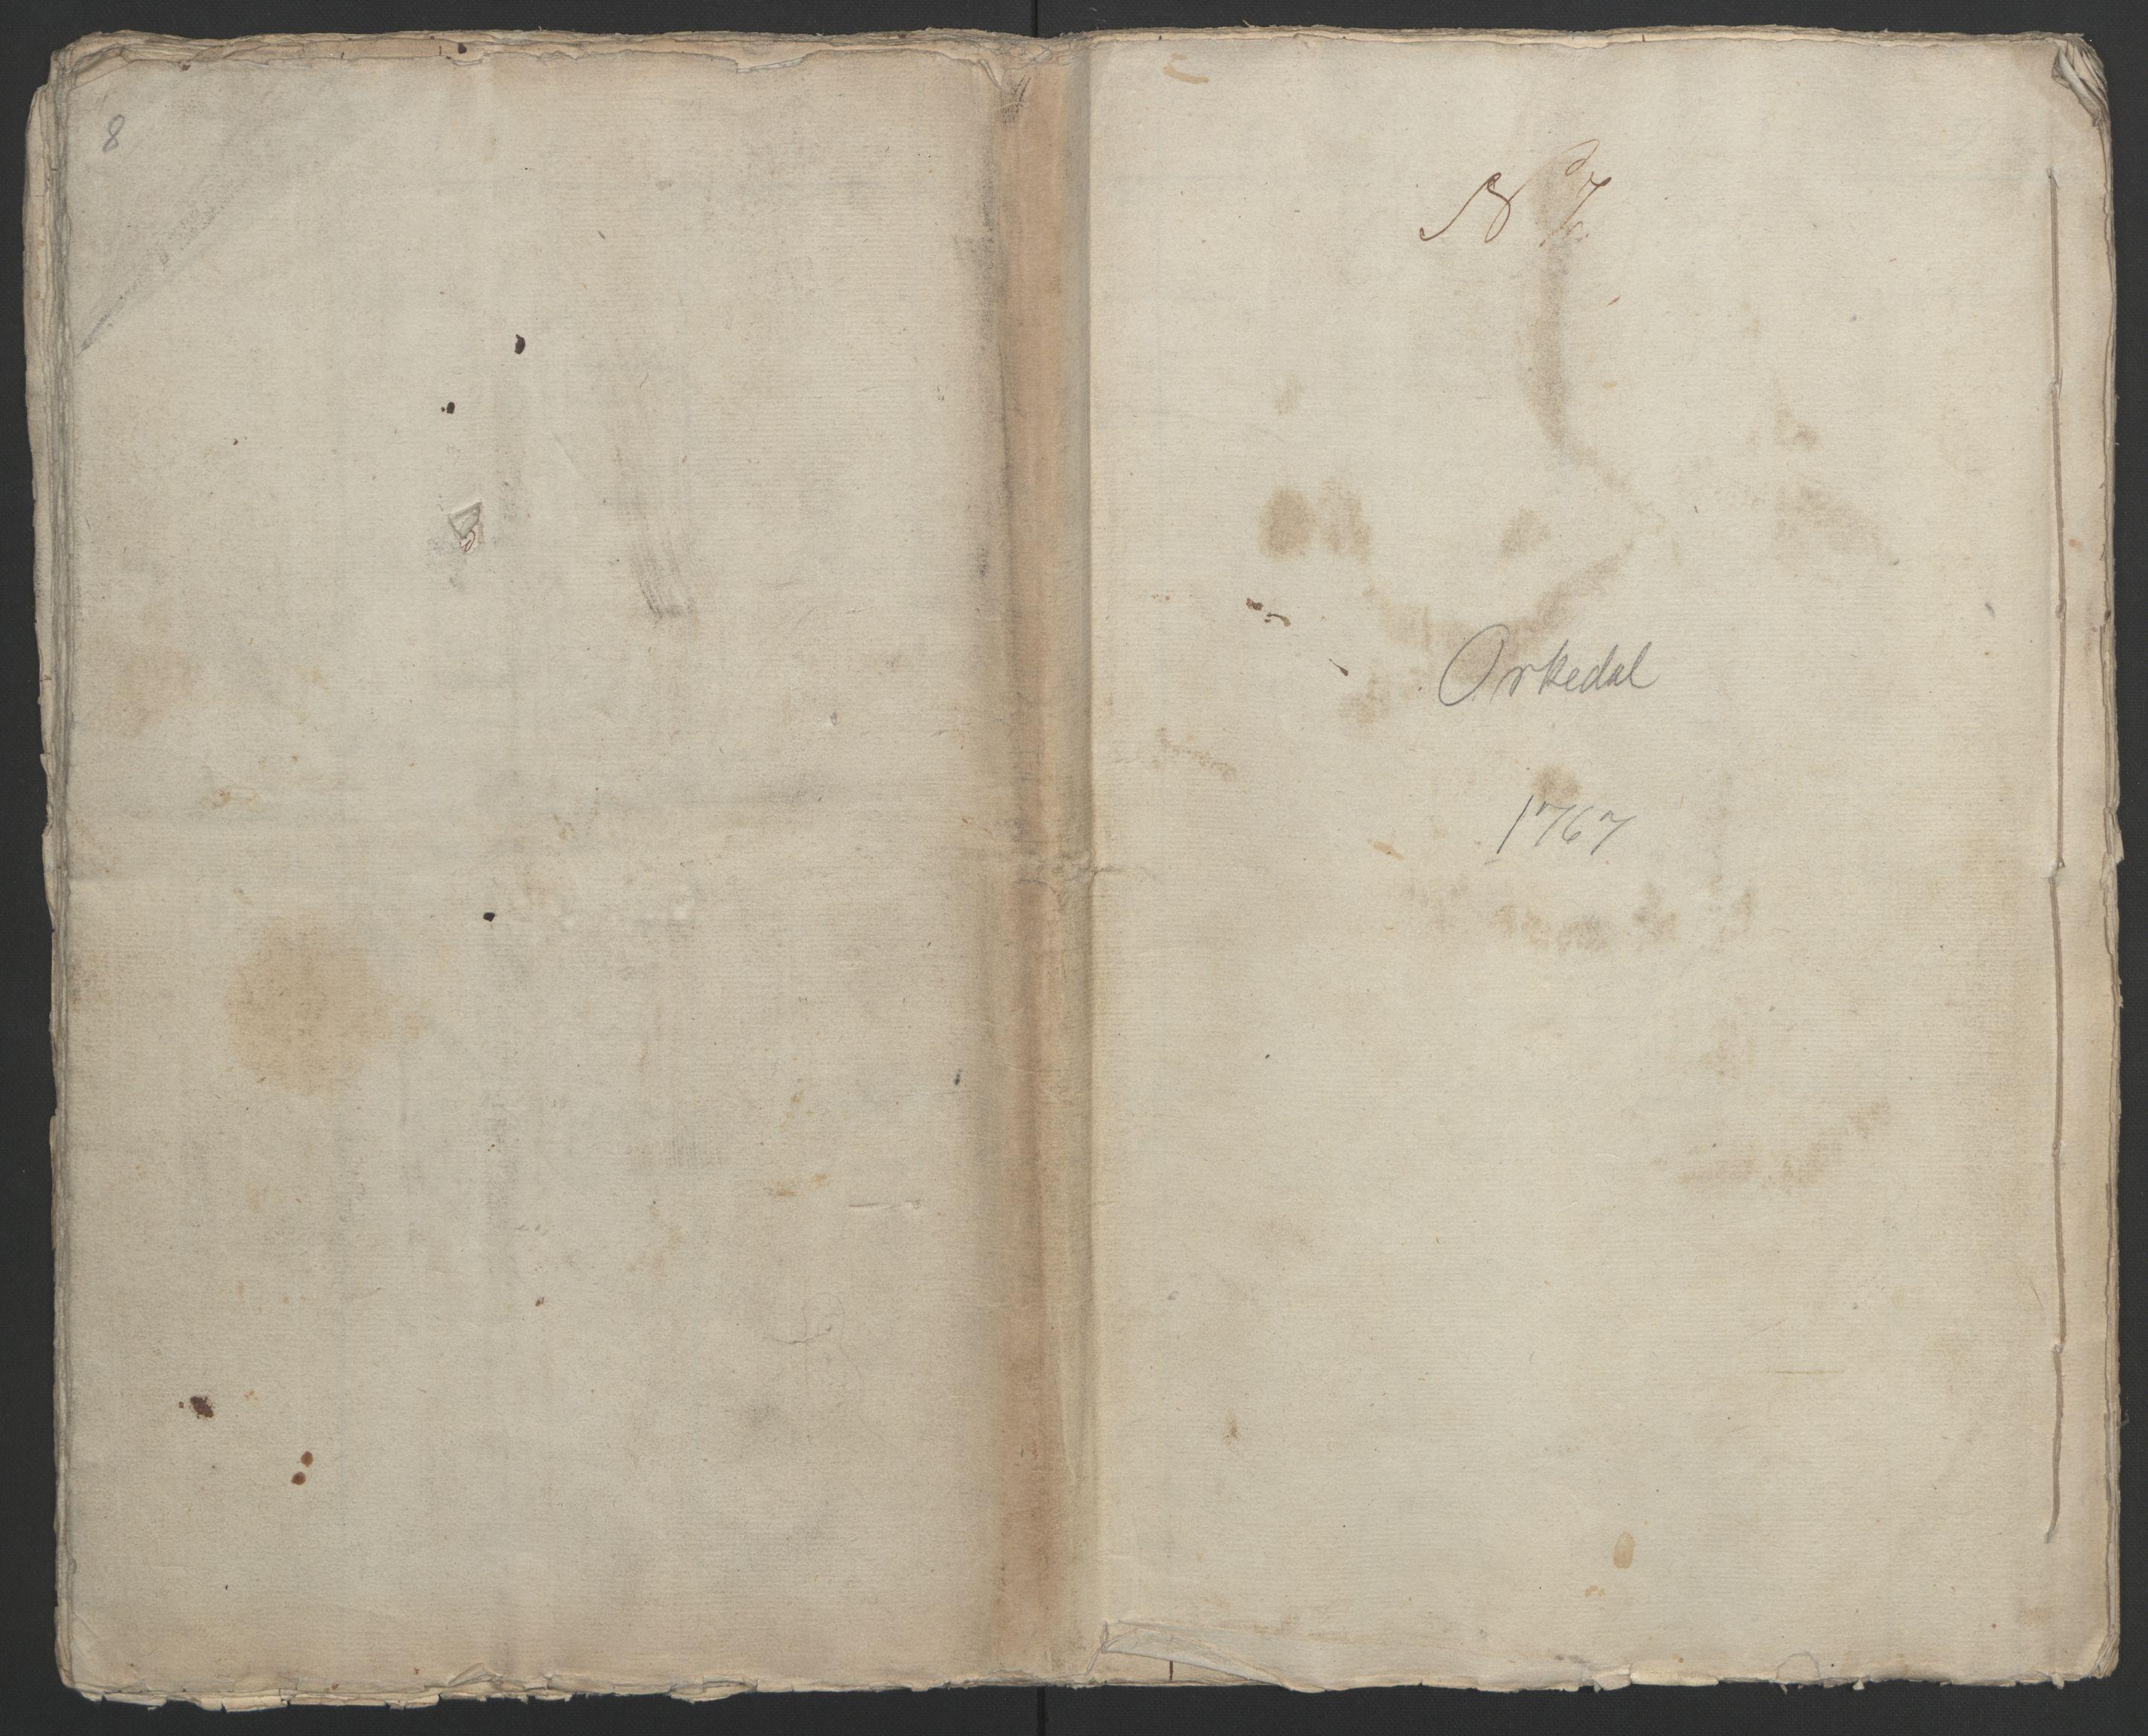 RA, Rentekammeret inntil 1814, Realistisk ordnet avdeling, Ol/L0021: [Gg 10]: Ekstraskatten, 23.09.1762. Orkdal og Gauldal, 1762-1767, s. 632